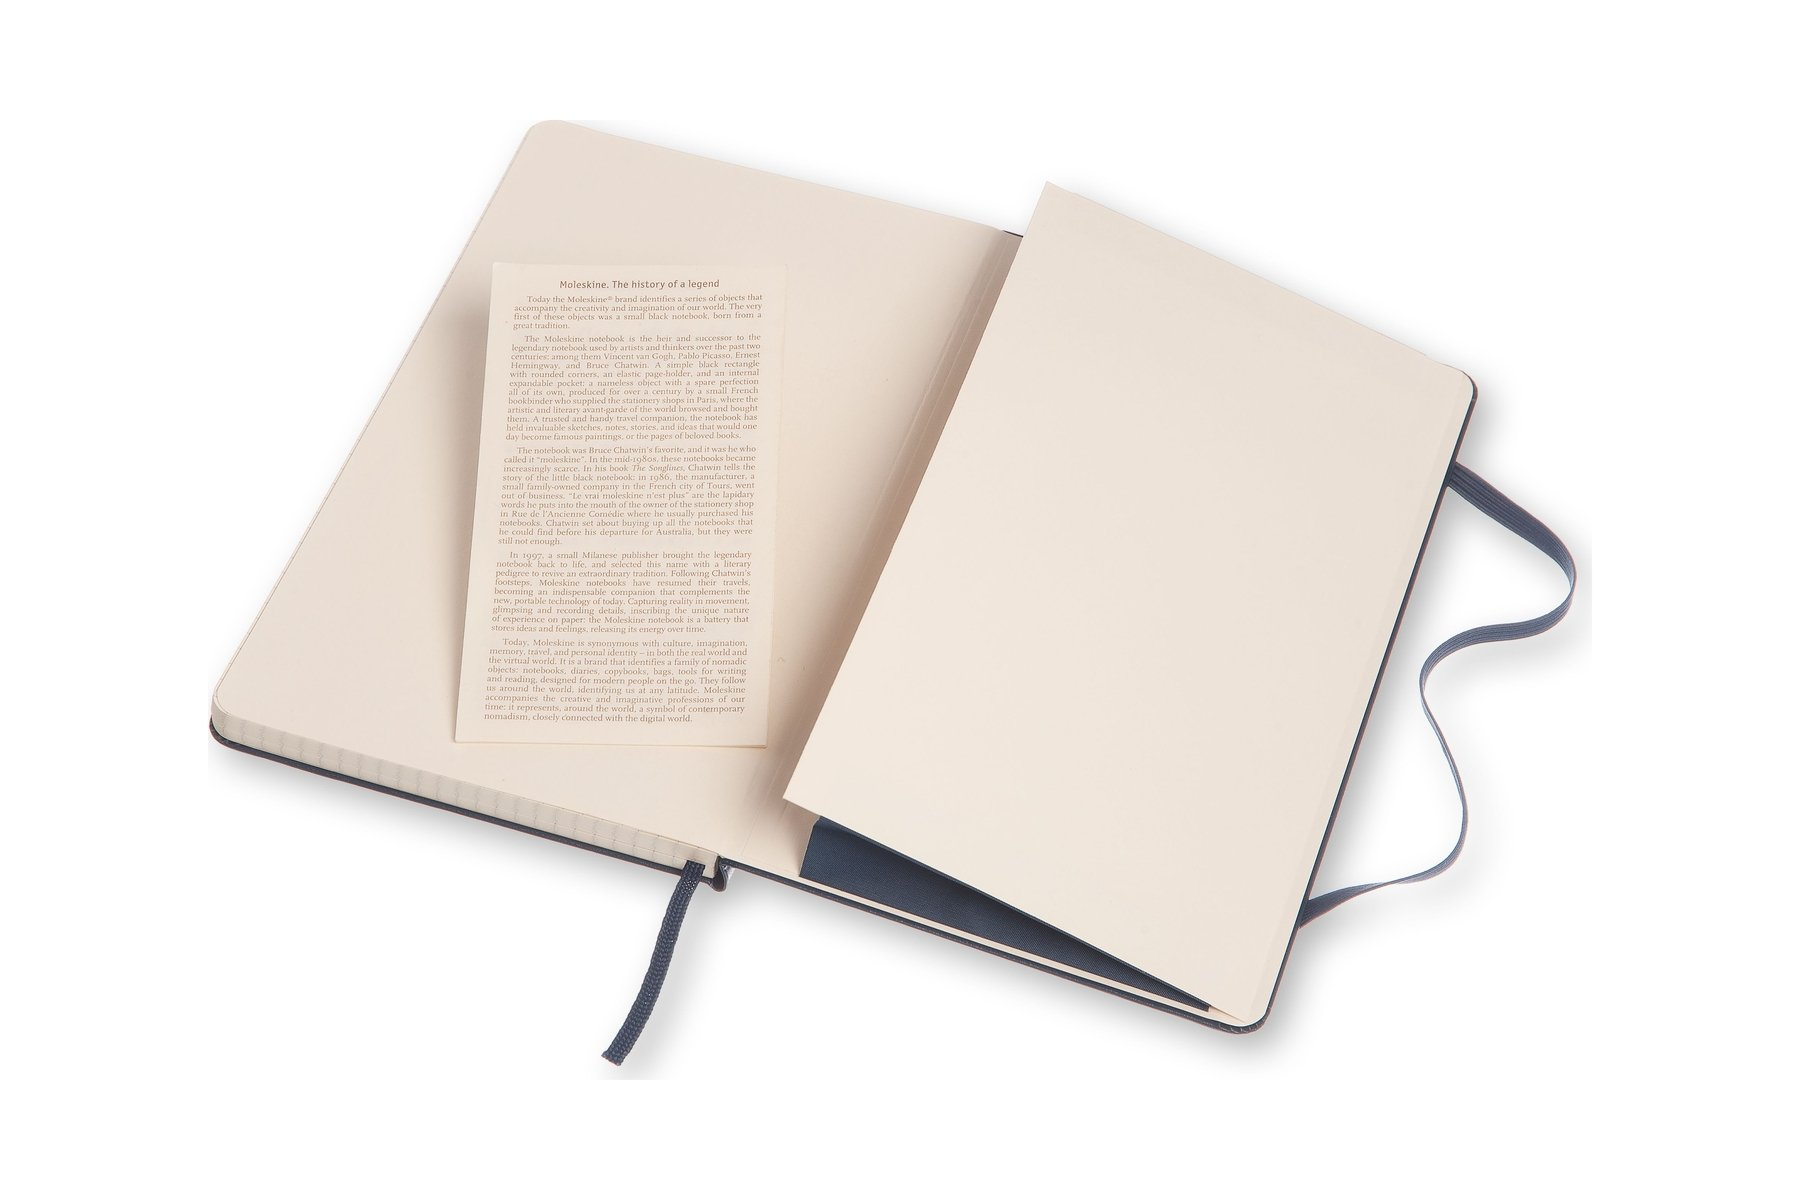 moleskine classic notebook large squared sapphire blue hard cover 5 x 825 moleskine 8051272893762 amazoncom books